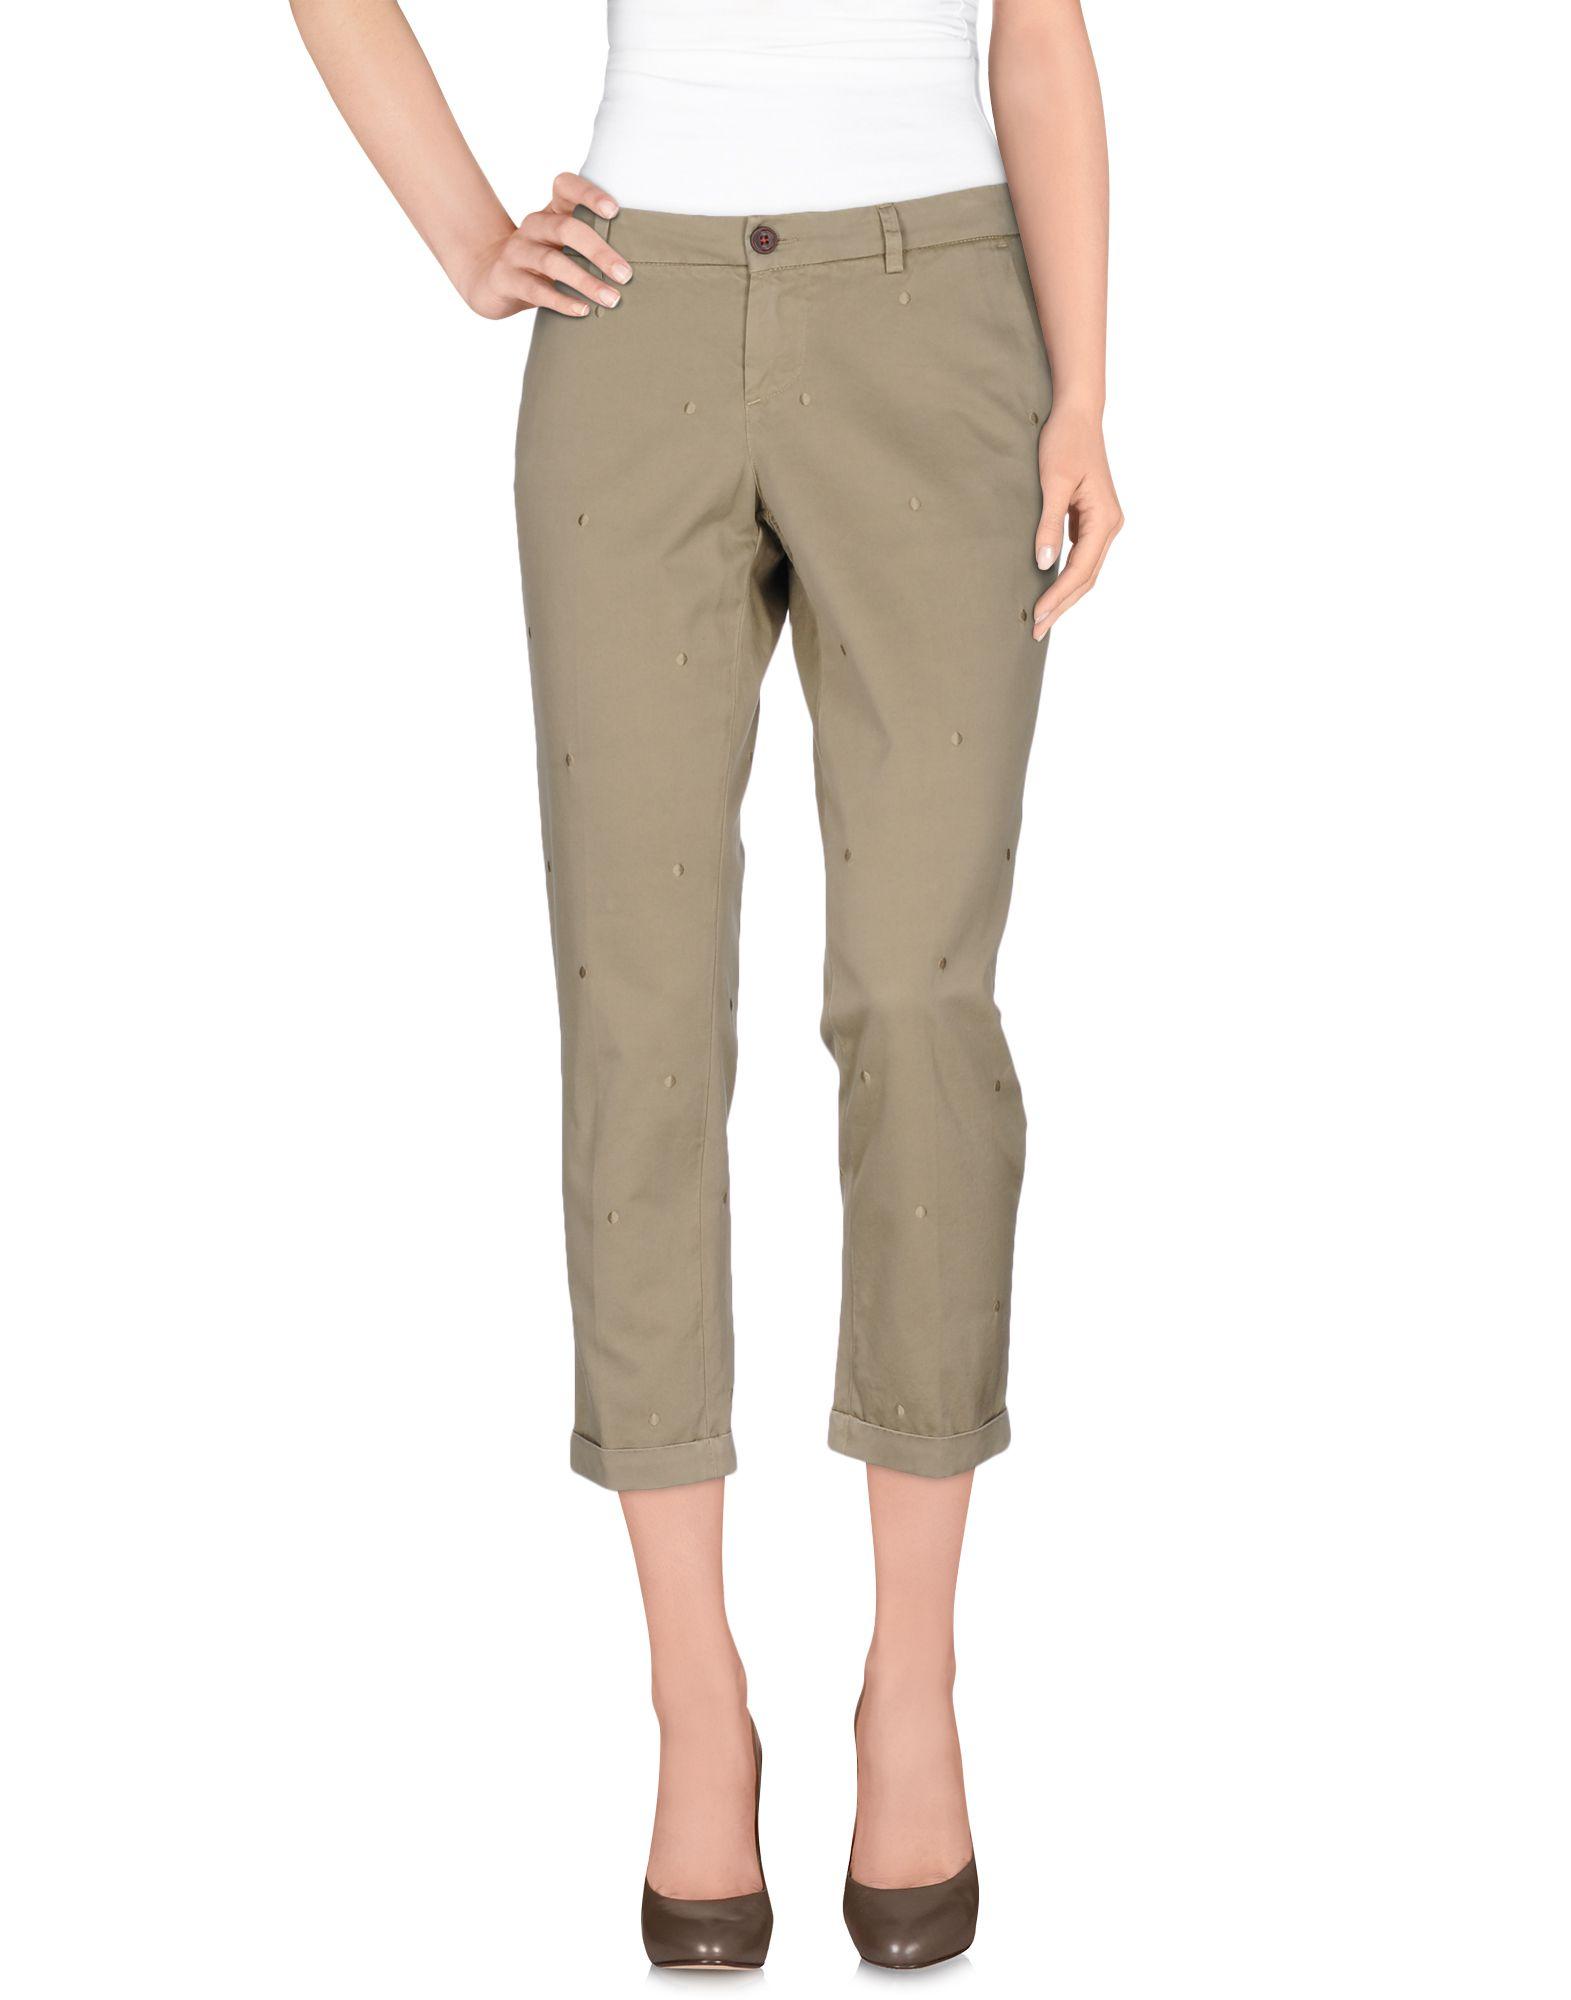 Pantalone Fay Donna - Acquista online su mfIaYSDT